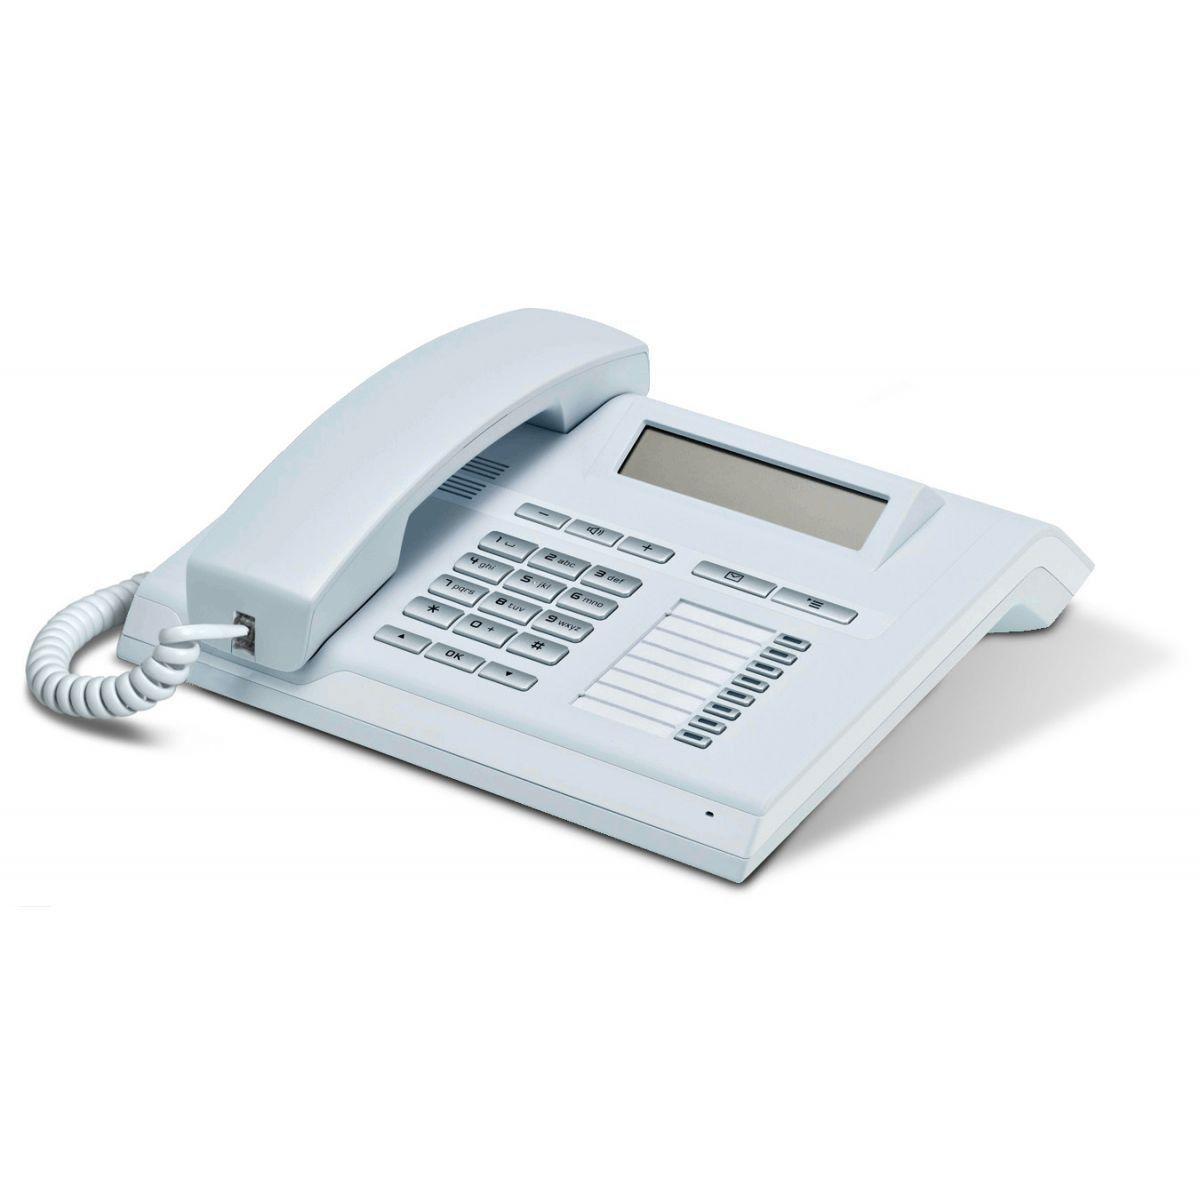 Telefone Digital OpenStage 15 SIP - Unify/Siemens